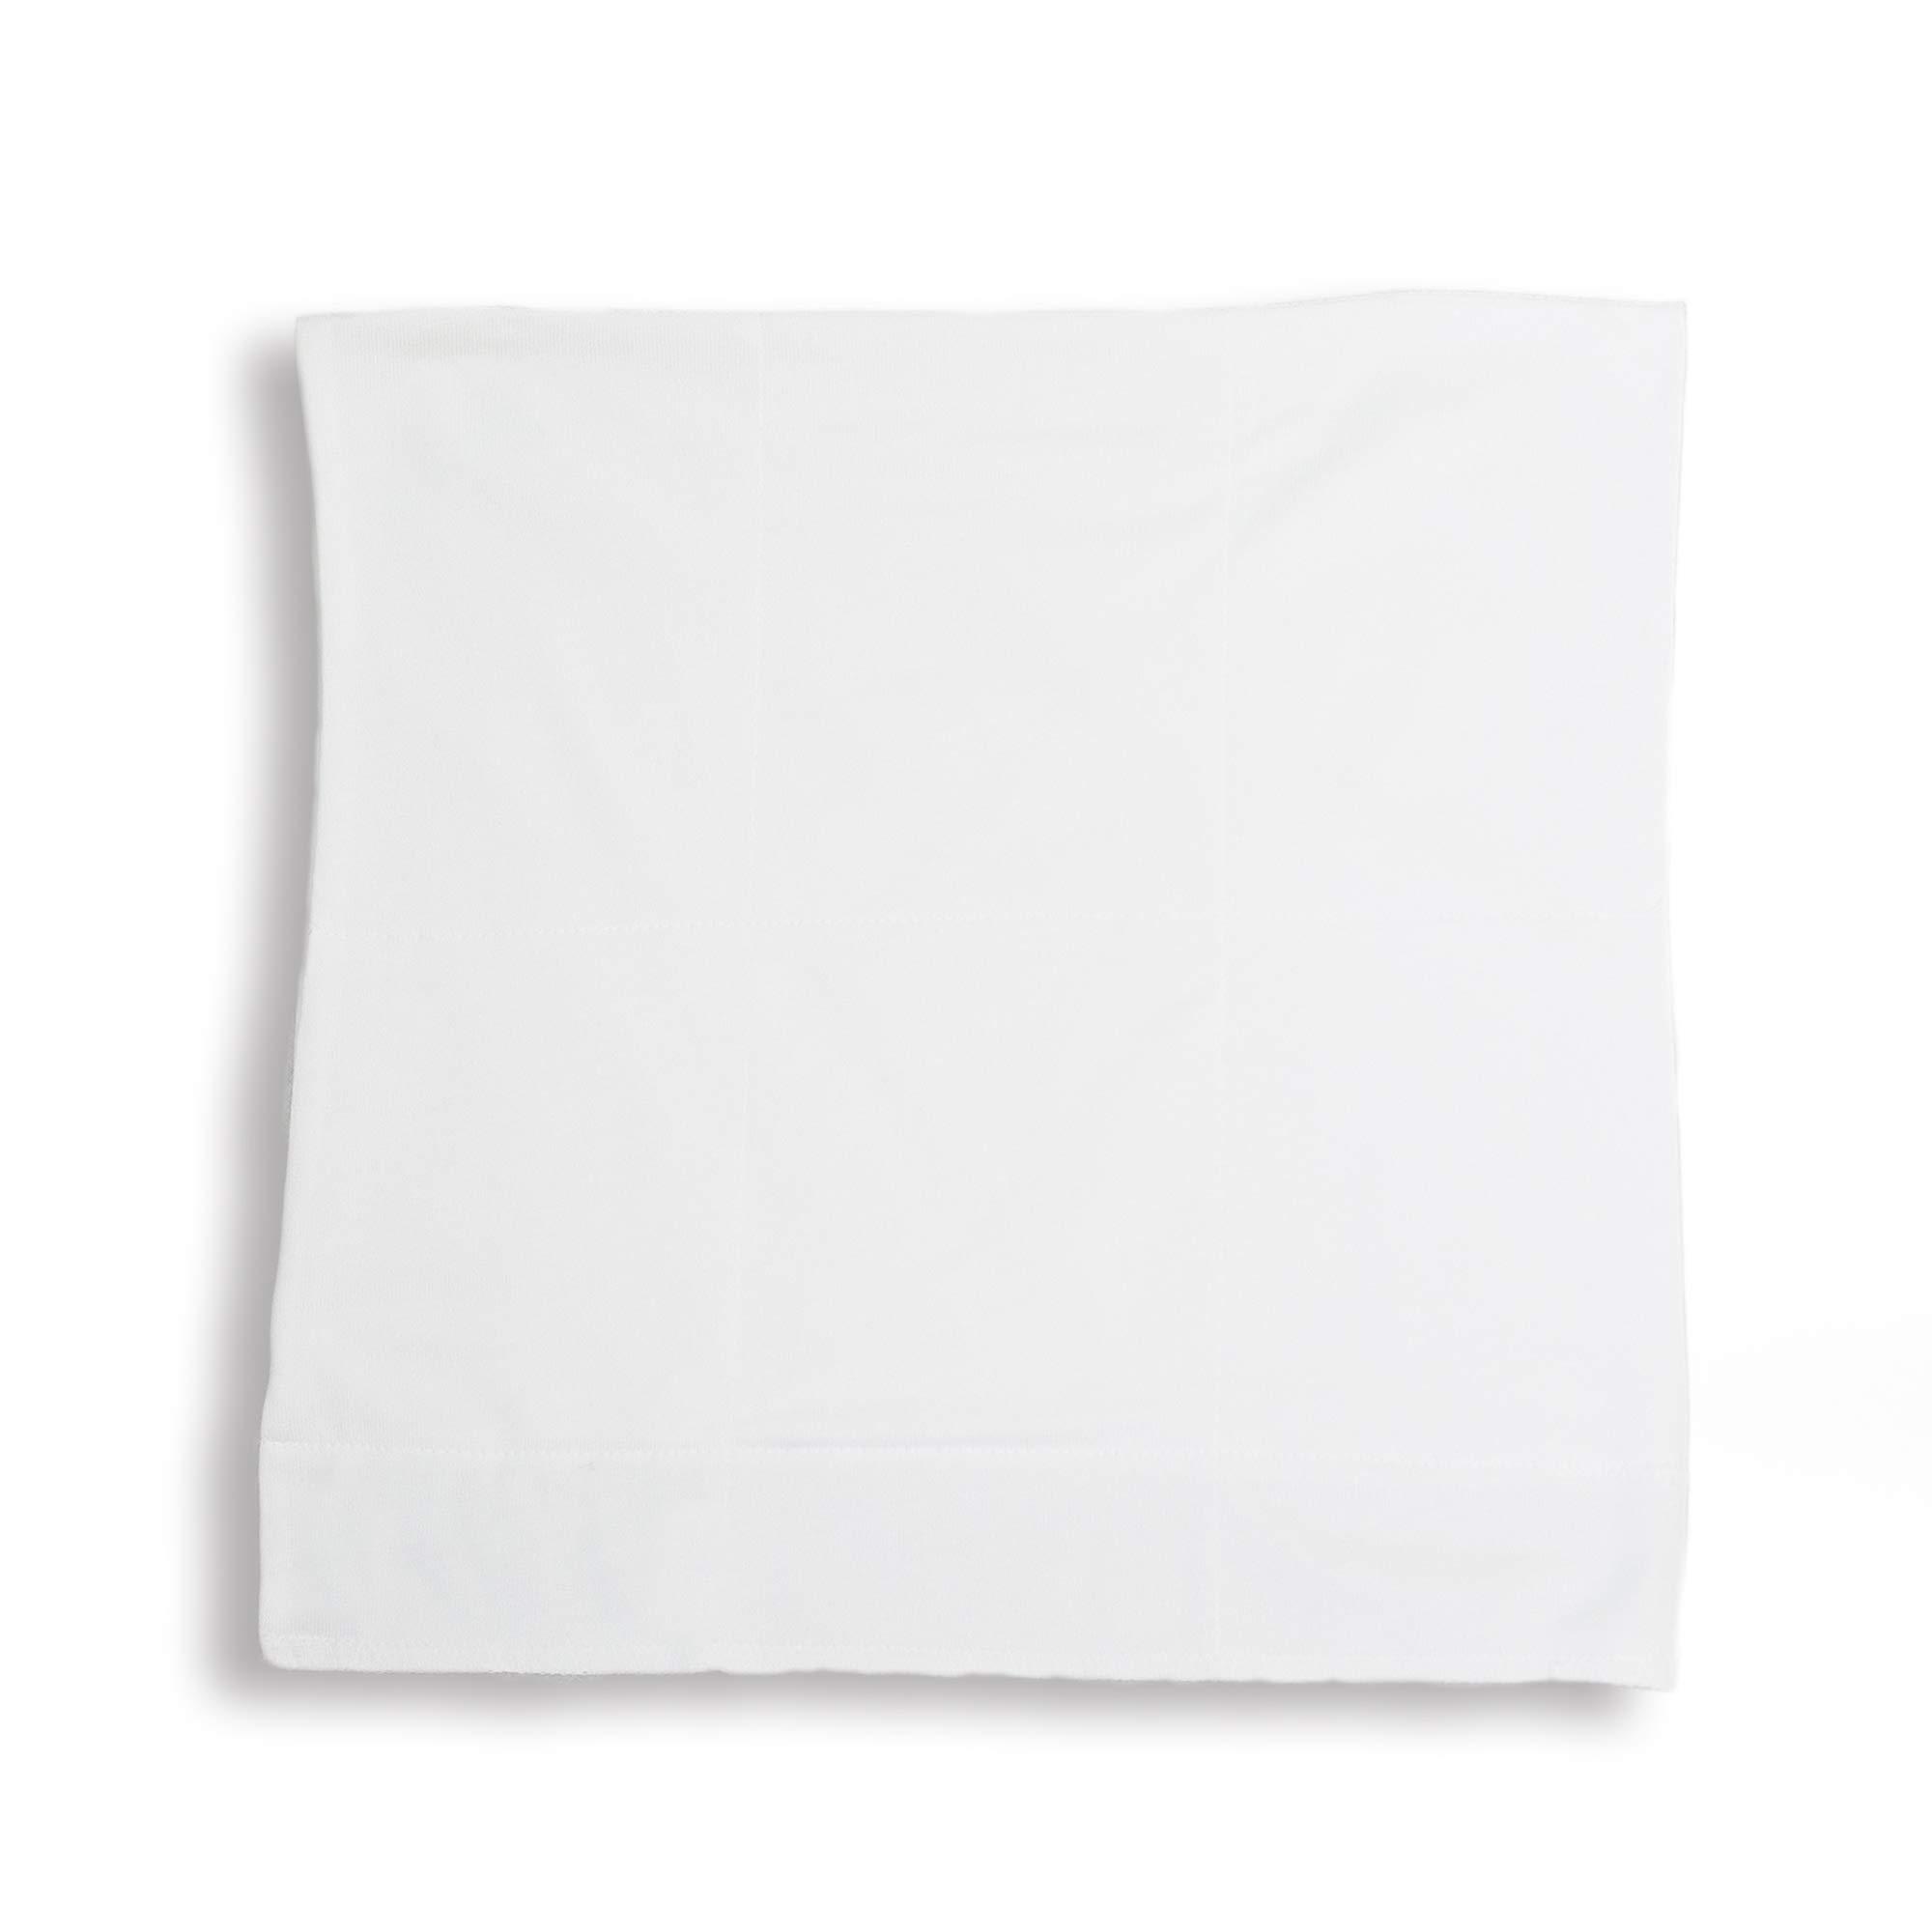 Thirsties Duo Hemp/Organic Cotton Cloth Prefold, Size One, 2 Pack